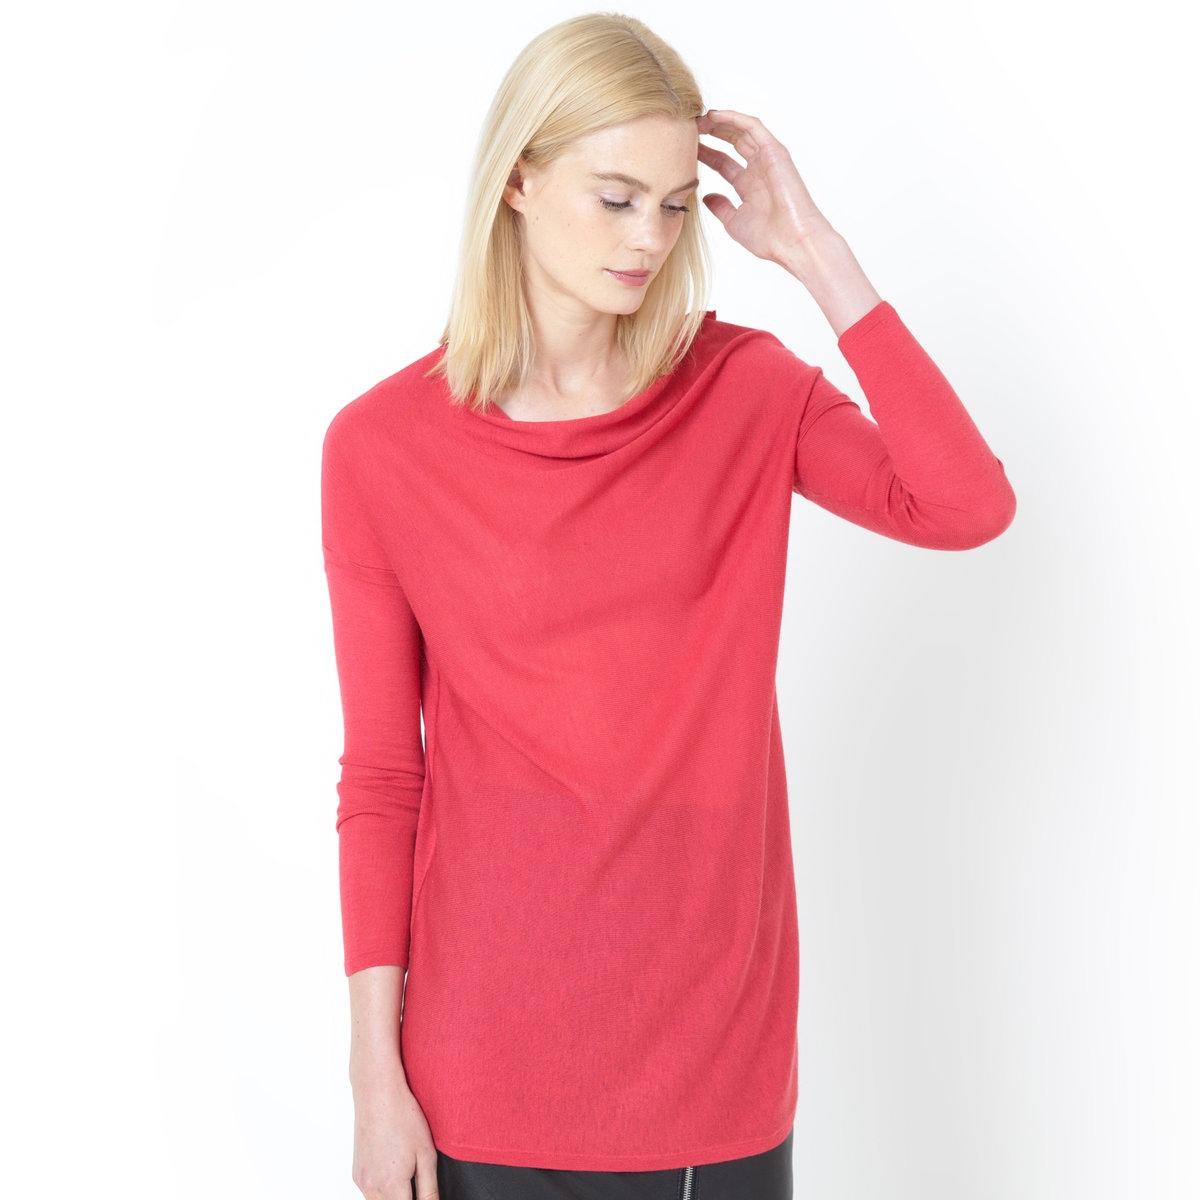 Пуловер с драпировкой на вырезе<br><br>Цвет: розовый<br>Размер: 50/52 (FR) - 56/58 (RUS)